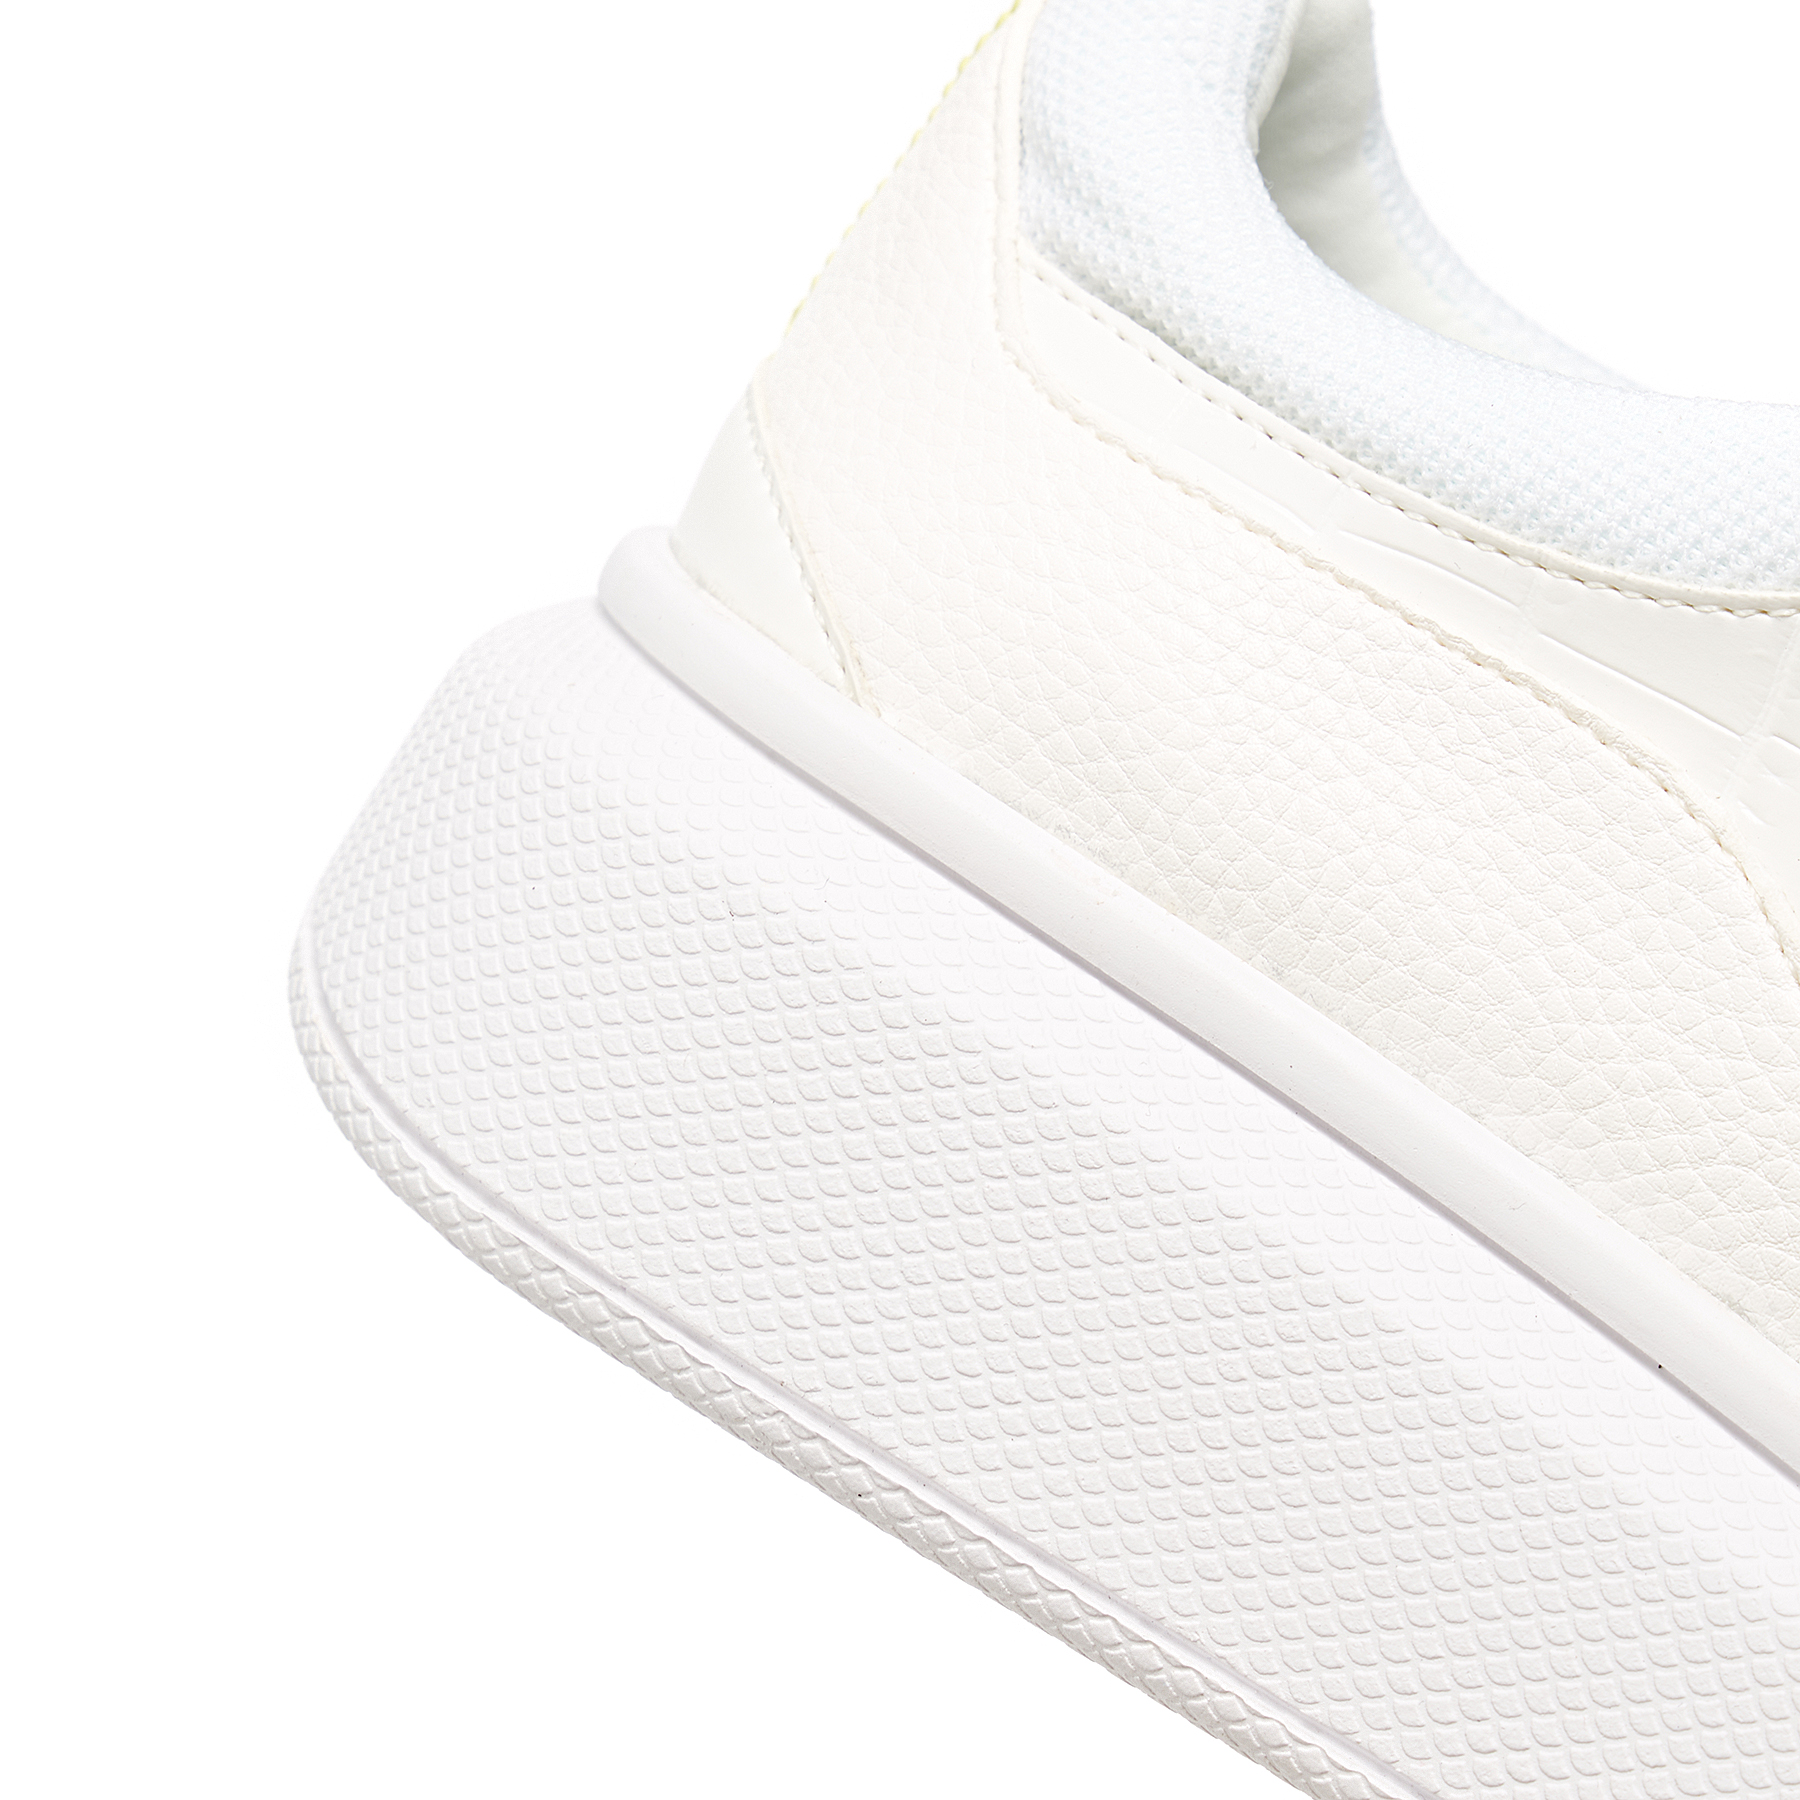 Ted Baker Arellia Damen Schuhe White Verkauf bei Country